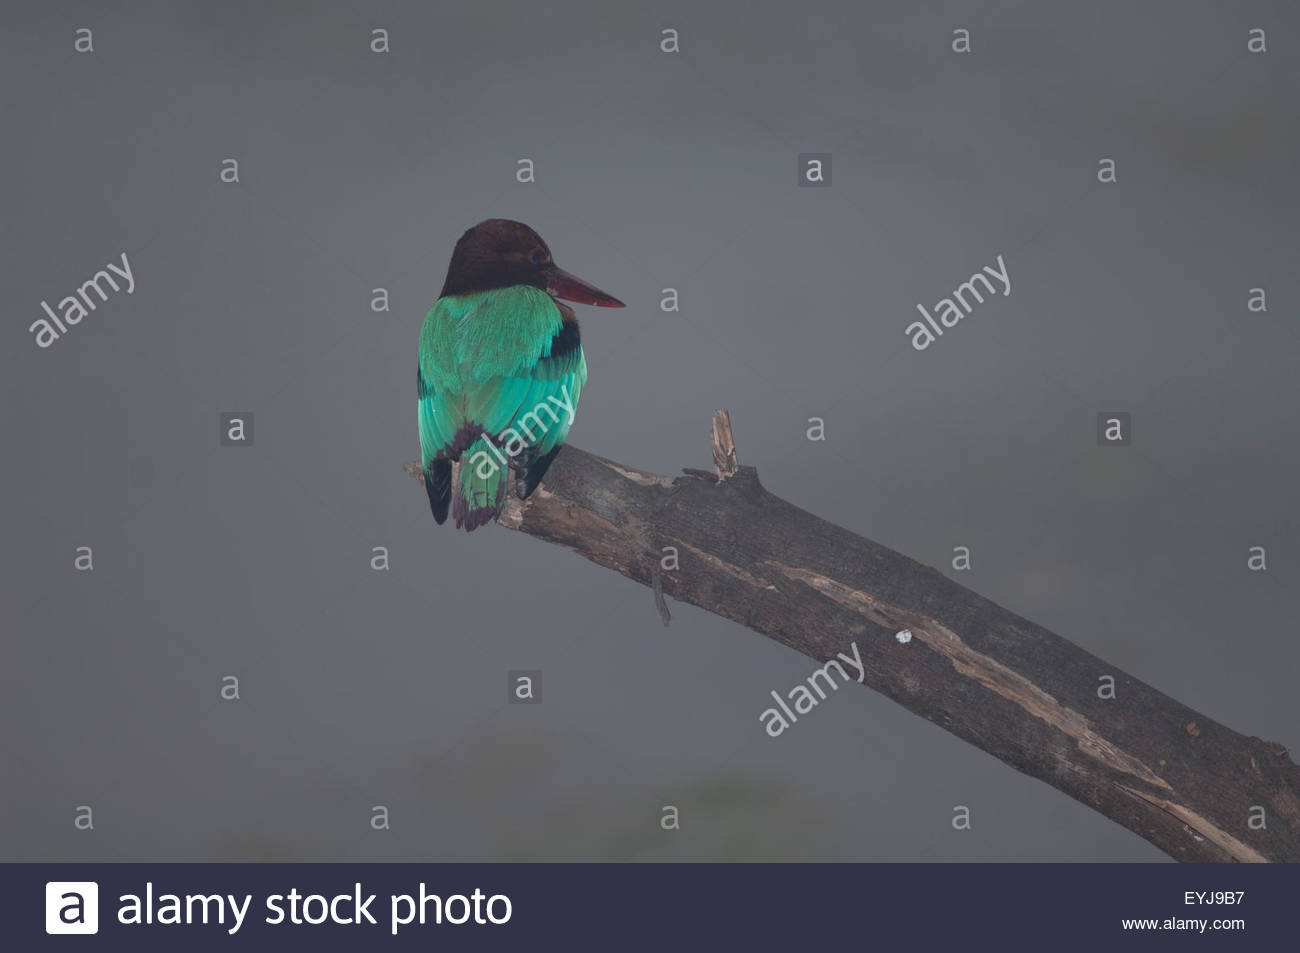 White-throated kingfisher (Halcyon smyrnensis). Keoladeo Ghana National Park. Rajasthan. India. - Stock Image